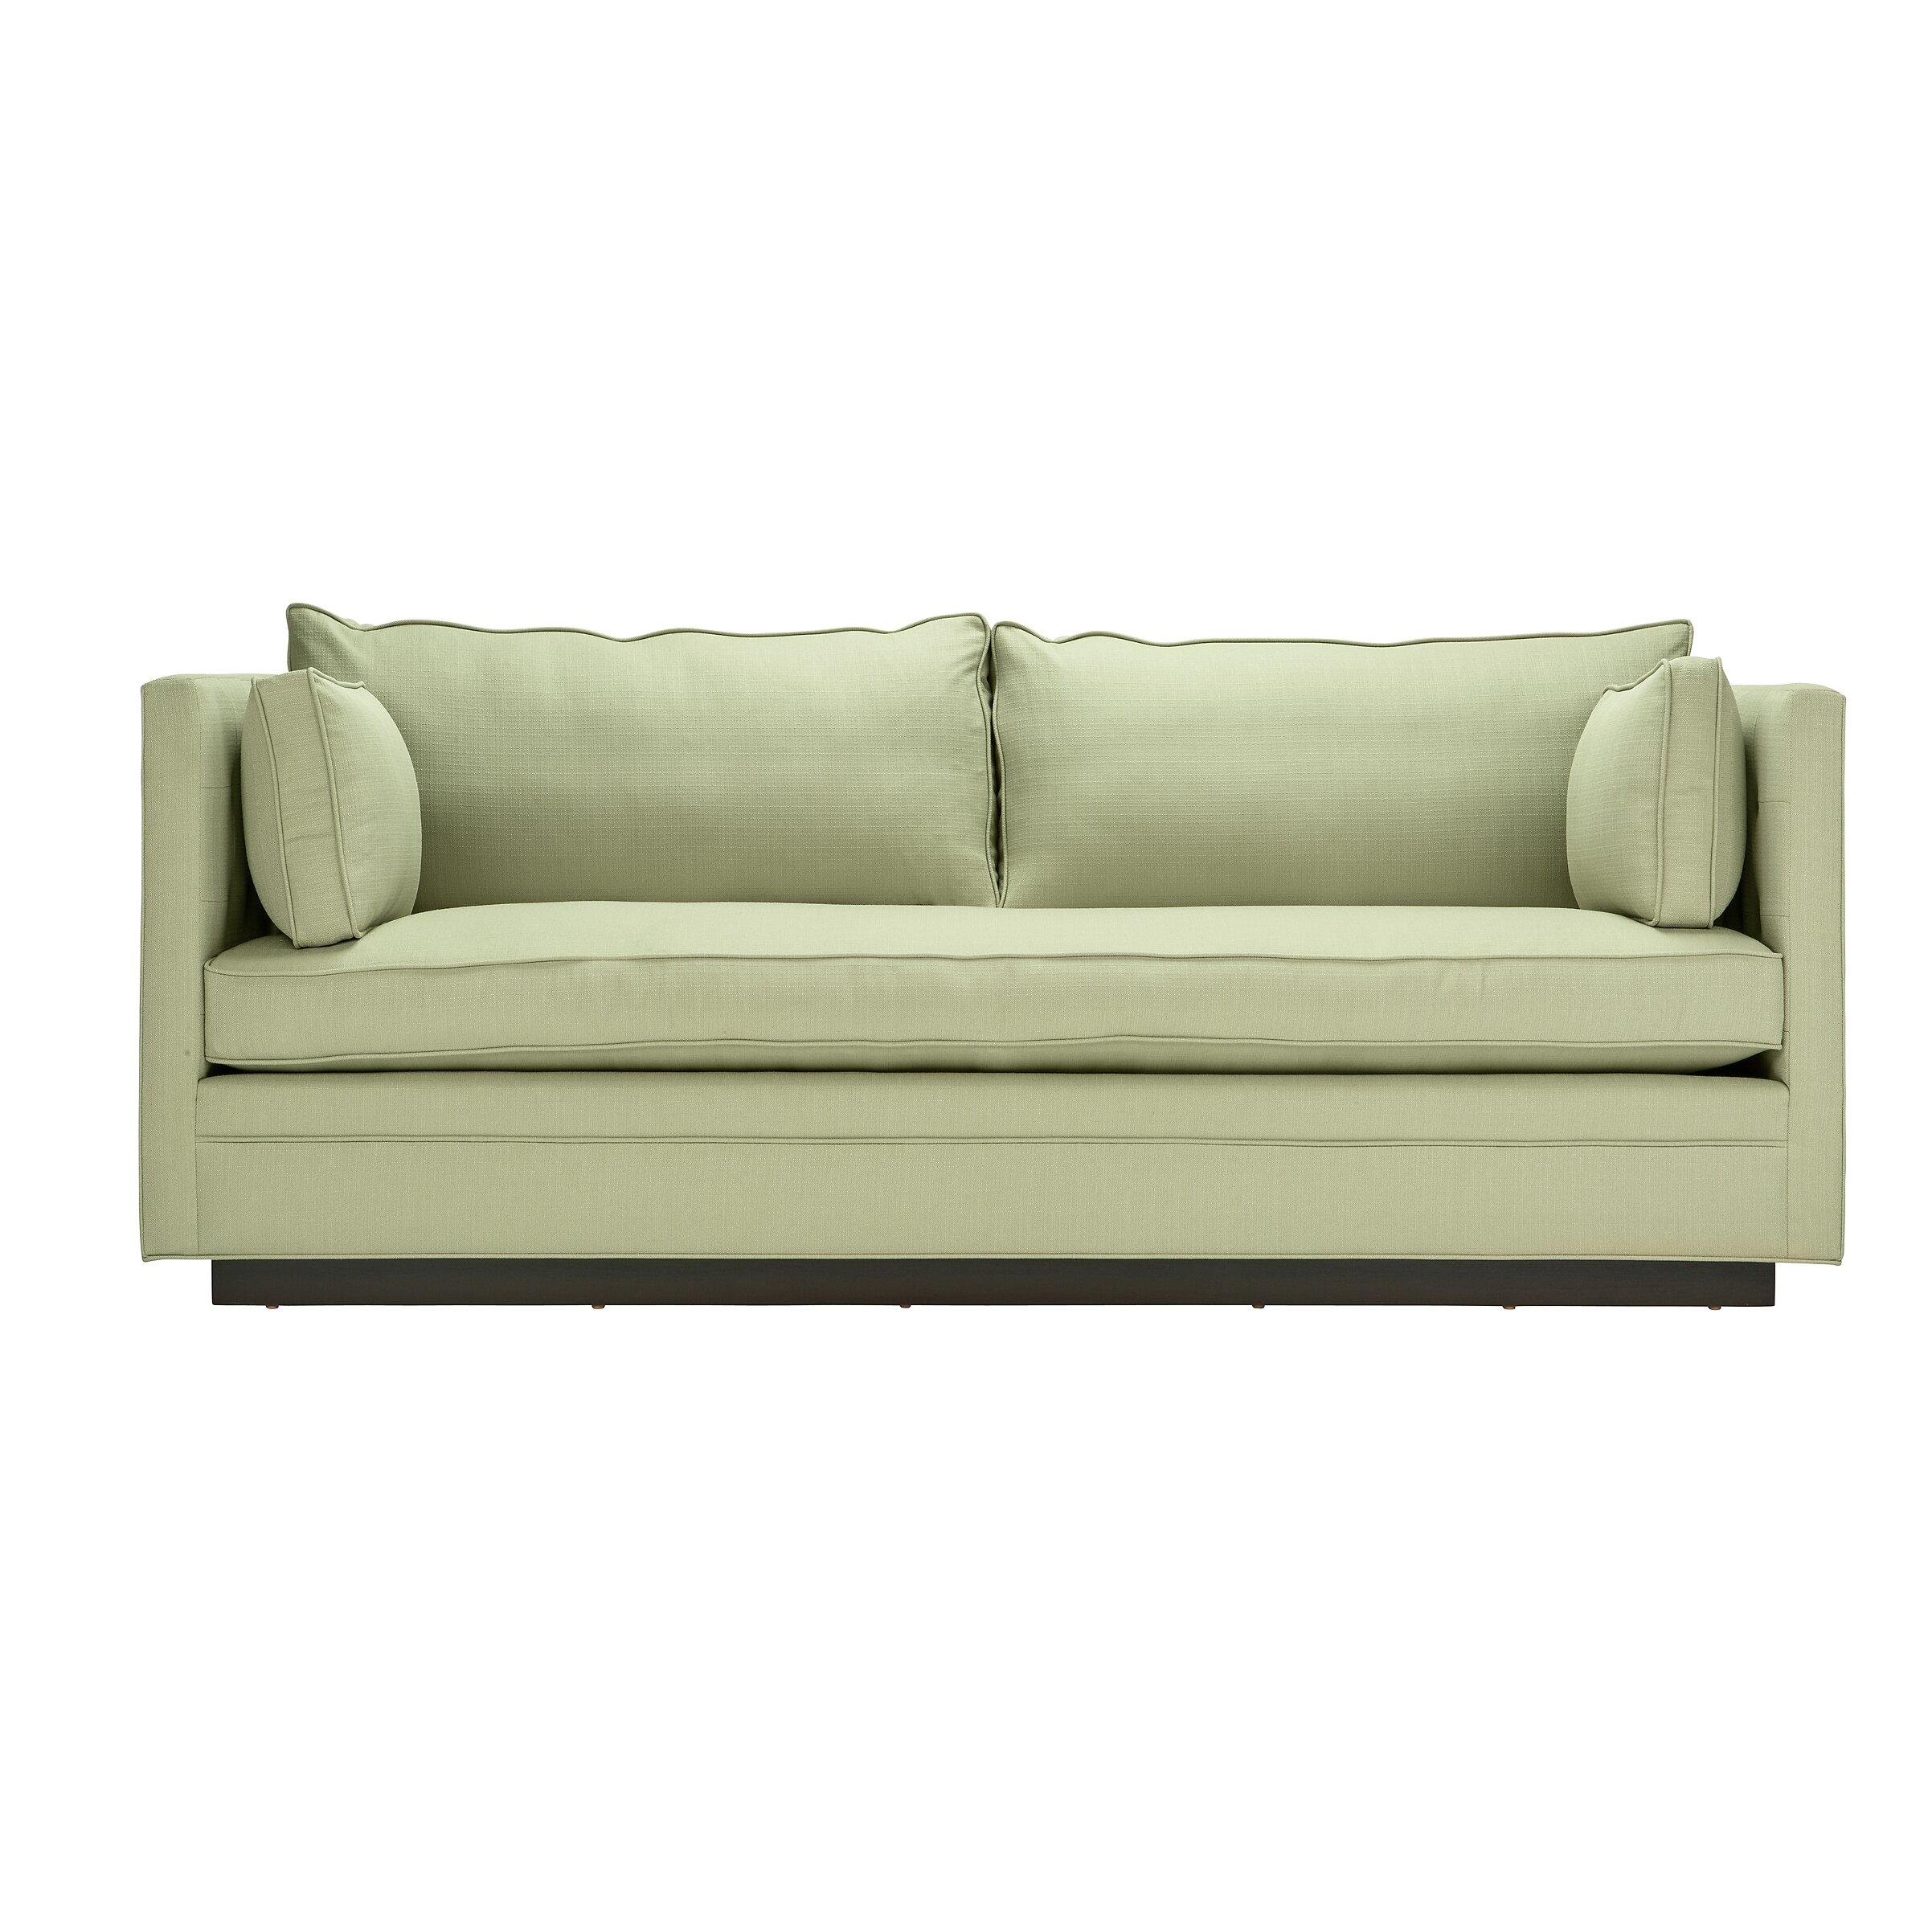 Jaxon Lamar Upholstered Sofa